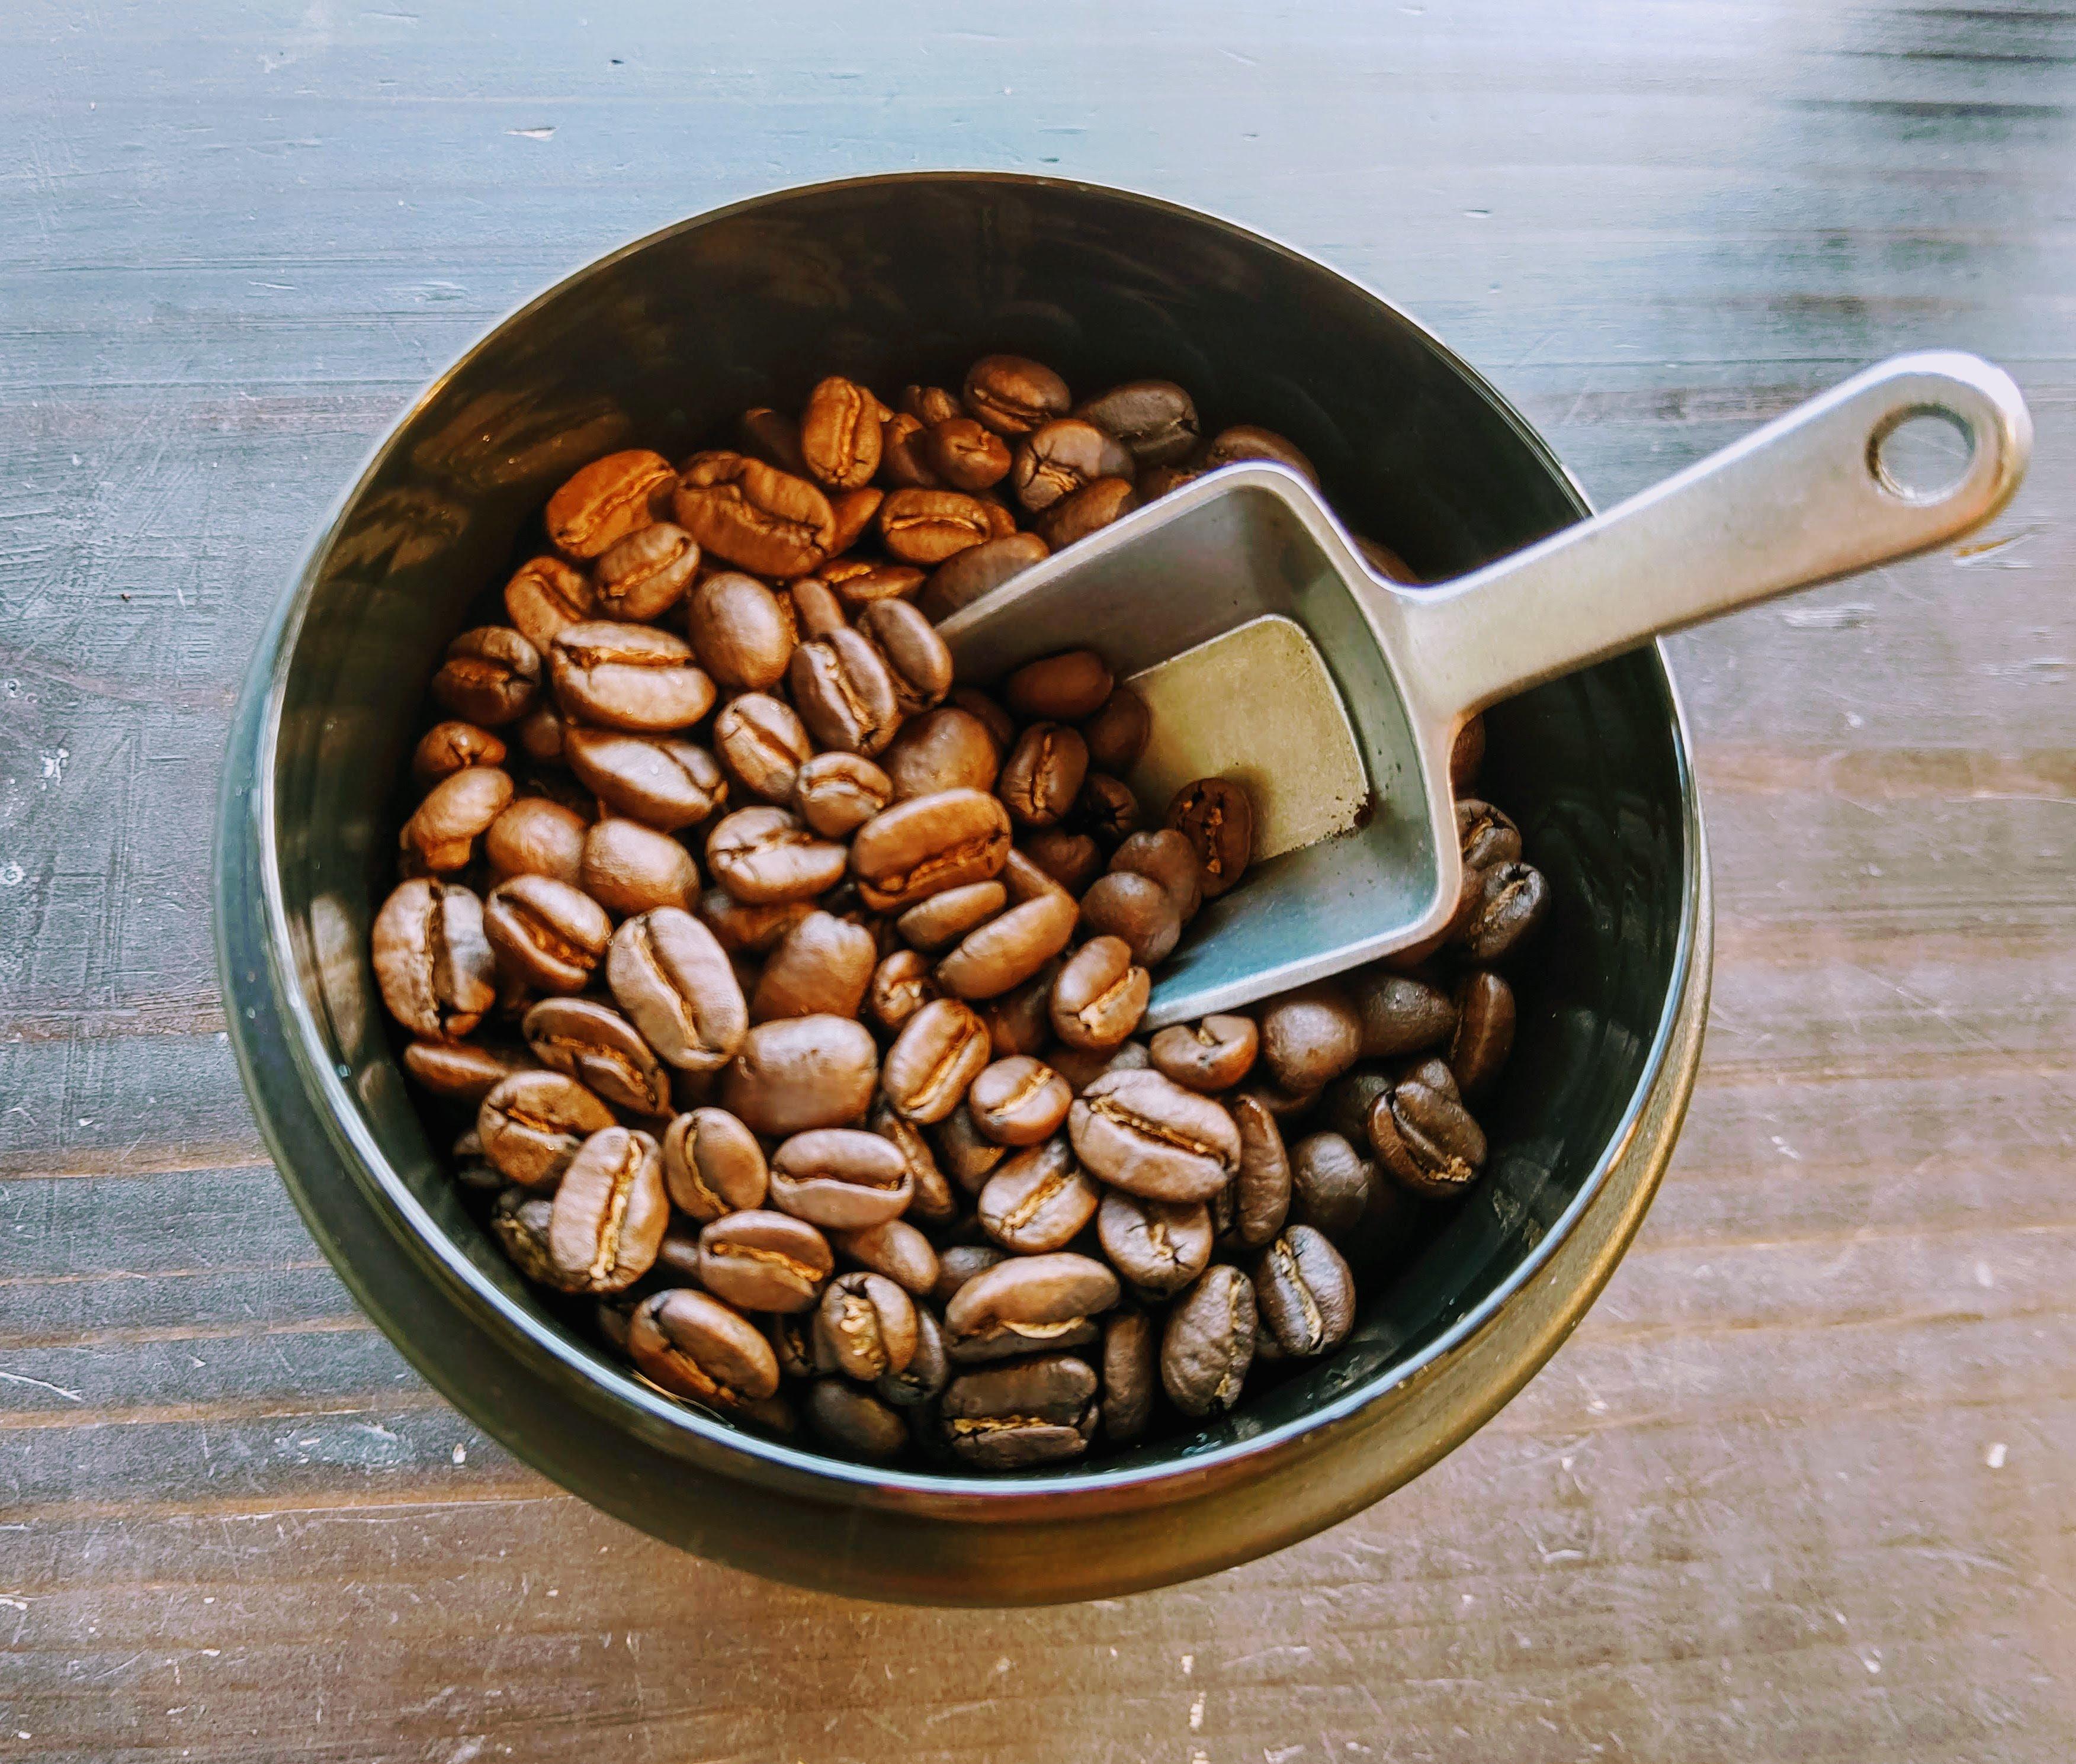 Book&Coffee coyomi コーヒー豆